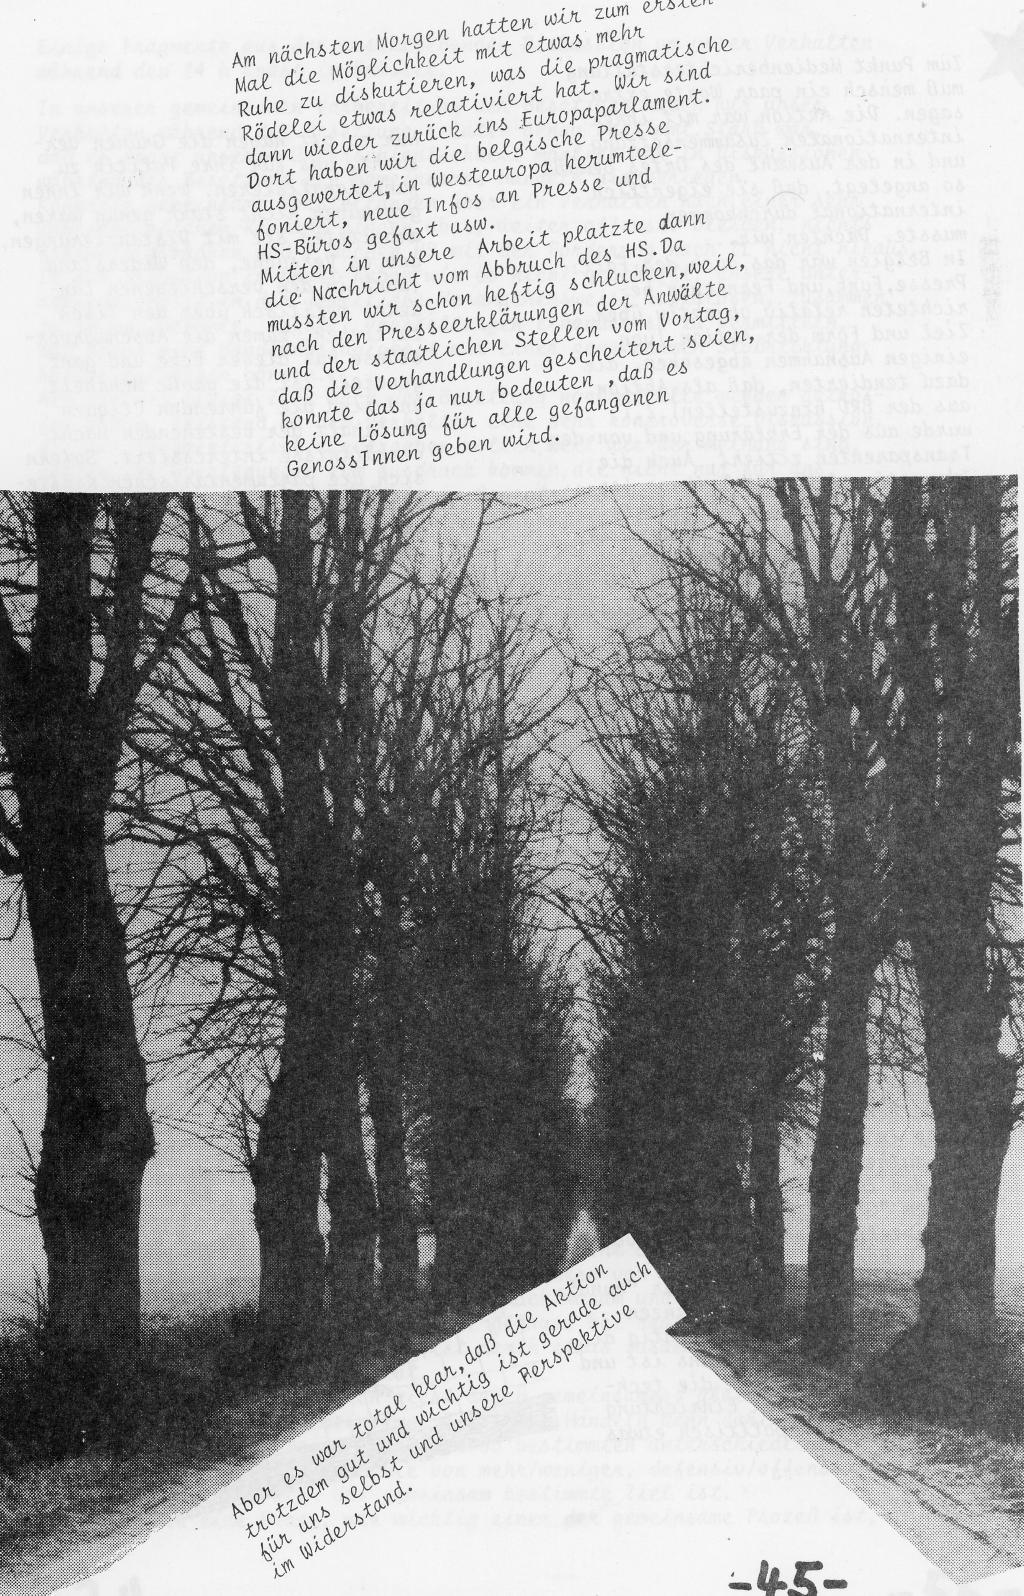 Belgien_Doku_Besetzung_EG_Kommission_1989_047